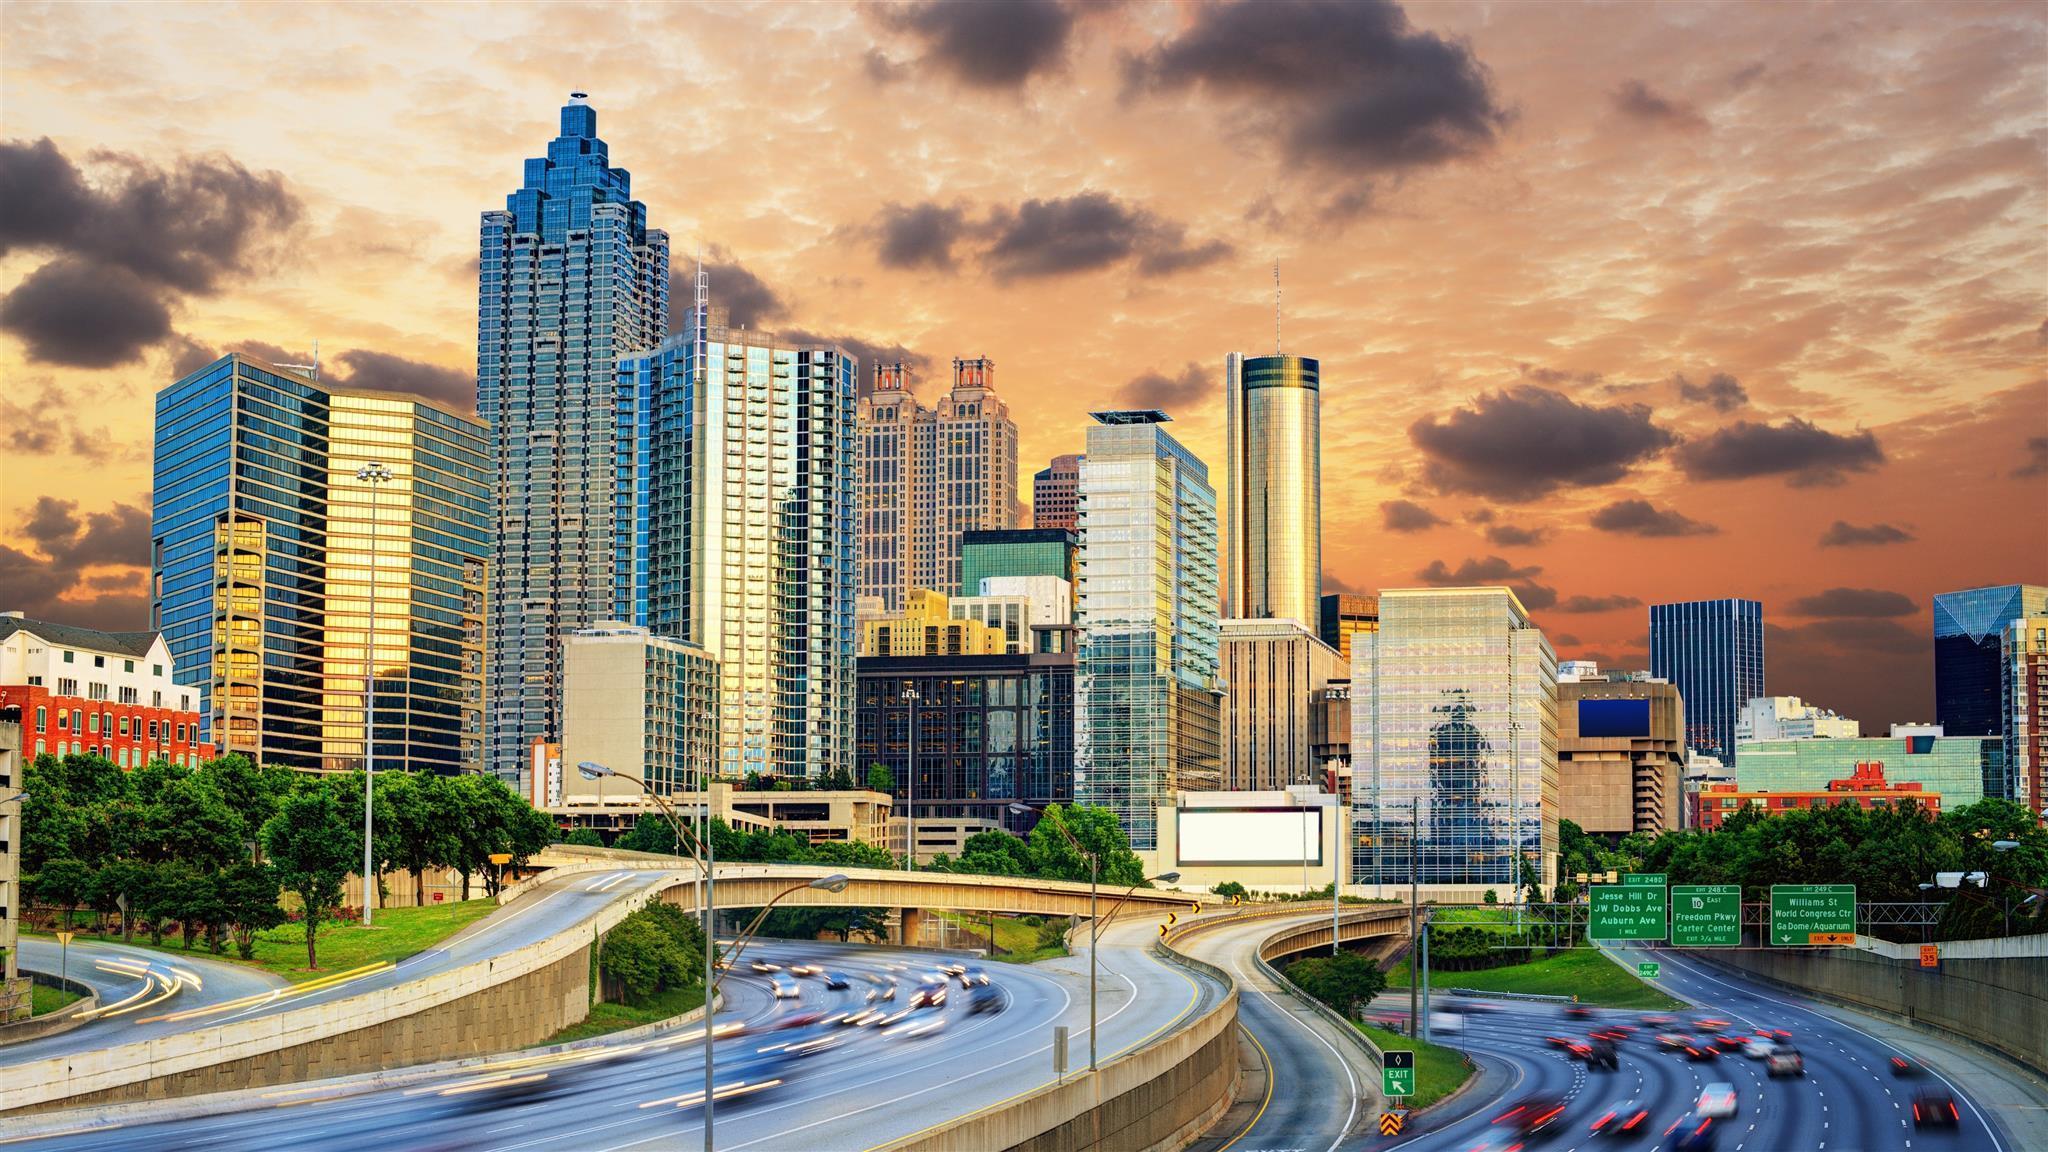 10 Best Atlanta Ga Hotels Hd Photos Reviews Of Hotels